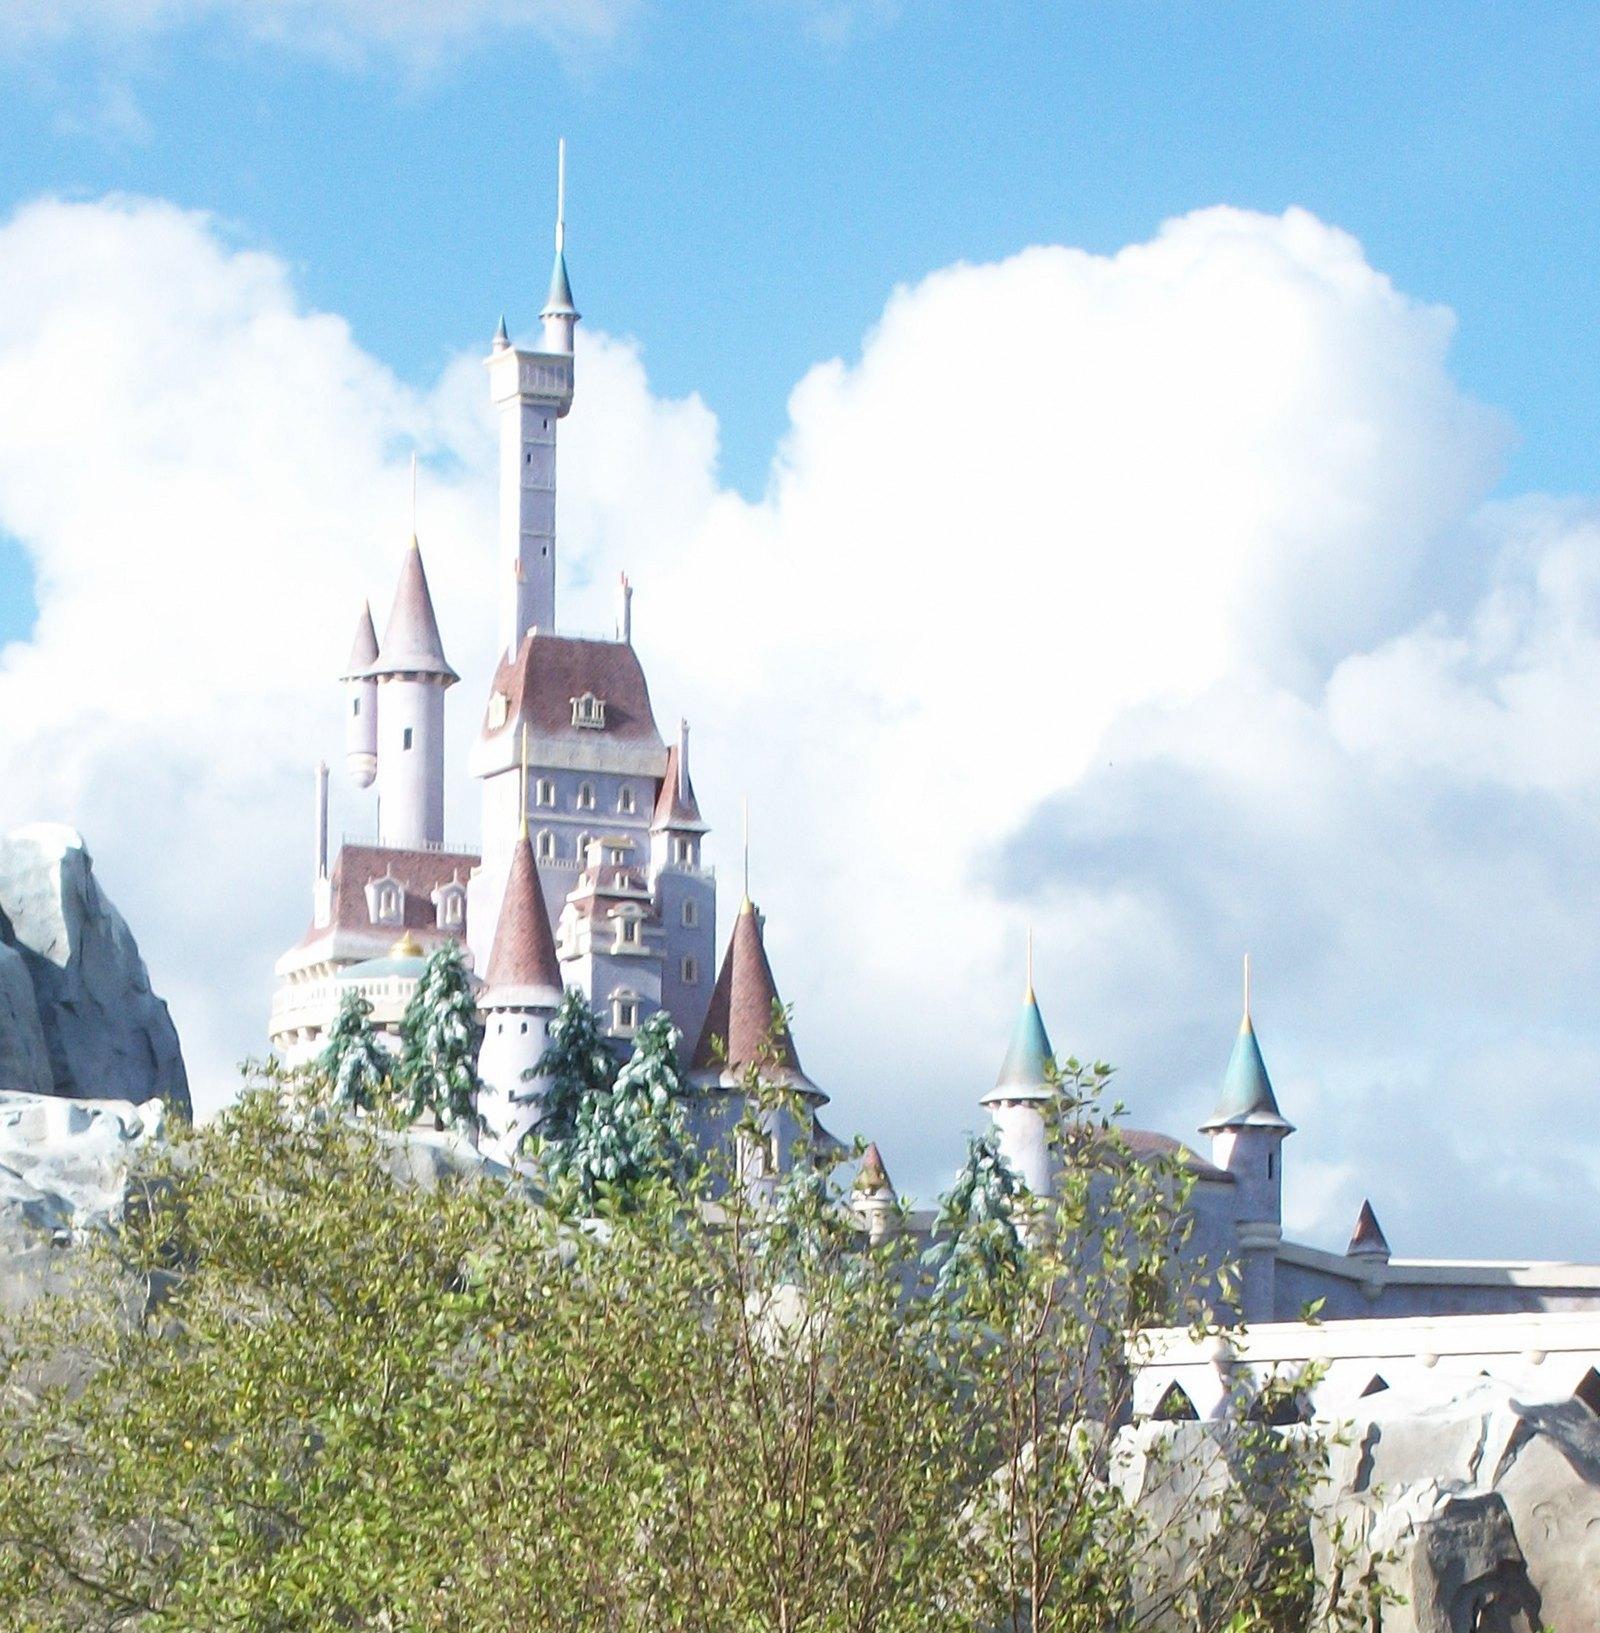 Beauty and the Beasts Castle Fantasyland - Disney Magic Kingdom